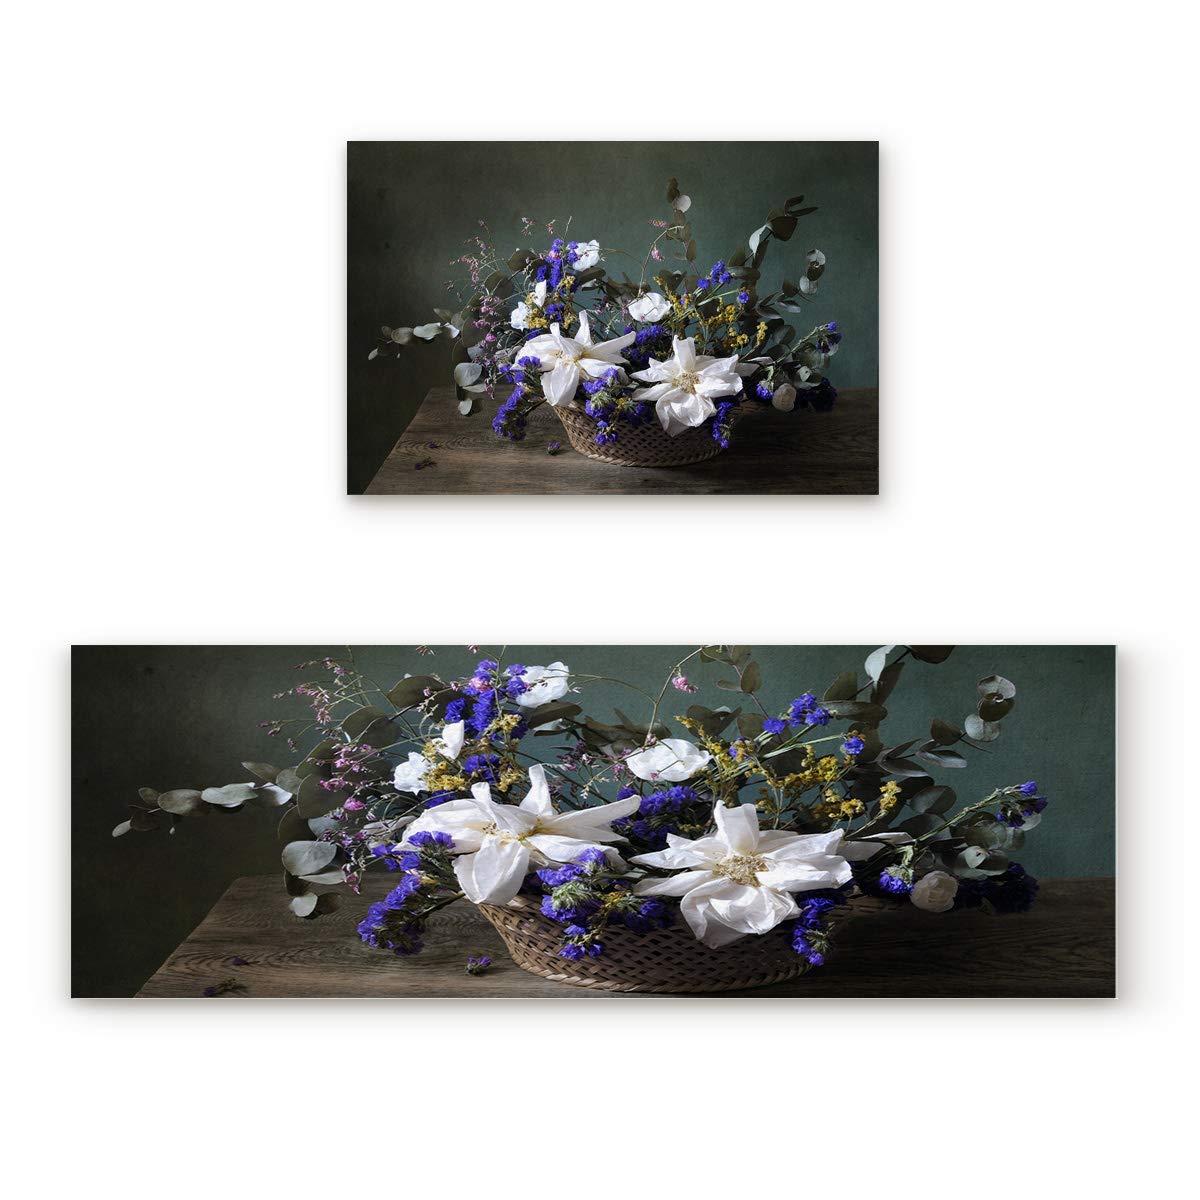 Flower96FIY1235 19.7x31.5In+19.7x47.2In Non-Slip Indoor Door Mat Entrance Rug Rectangle Absorbent Moisture Floor Carpet for Vintage Brown Jacquard with White Background Doormat 23.6x35.4In+23.6x70.9In